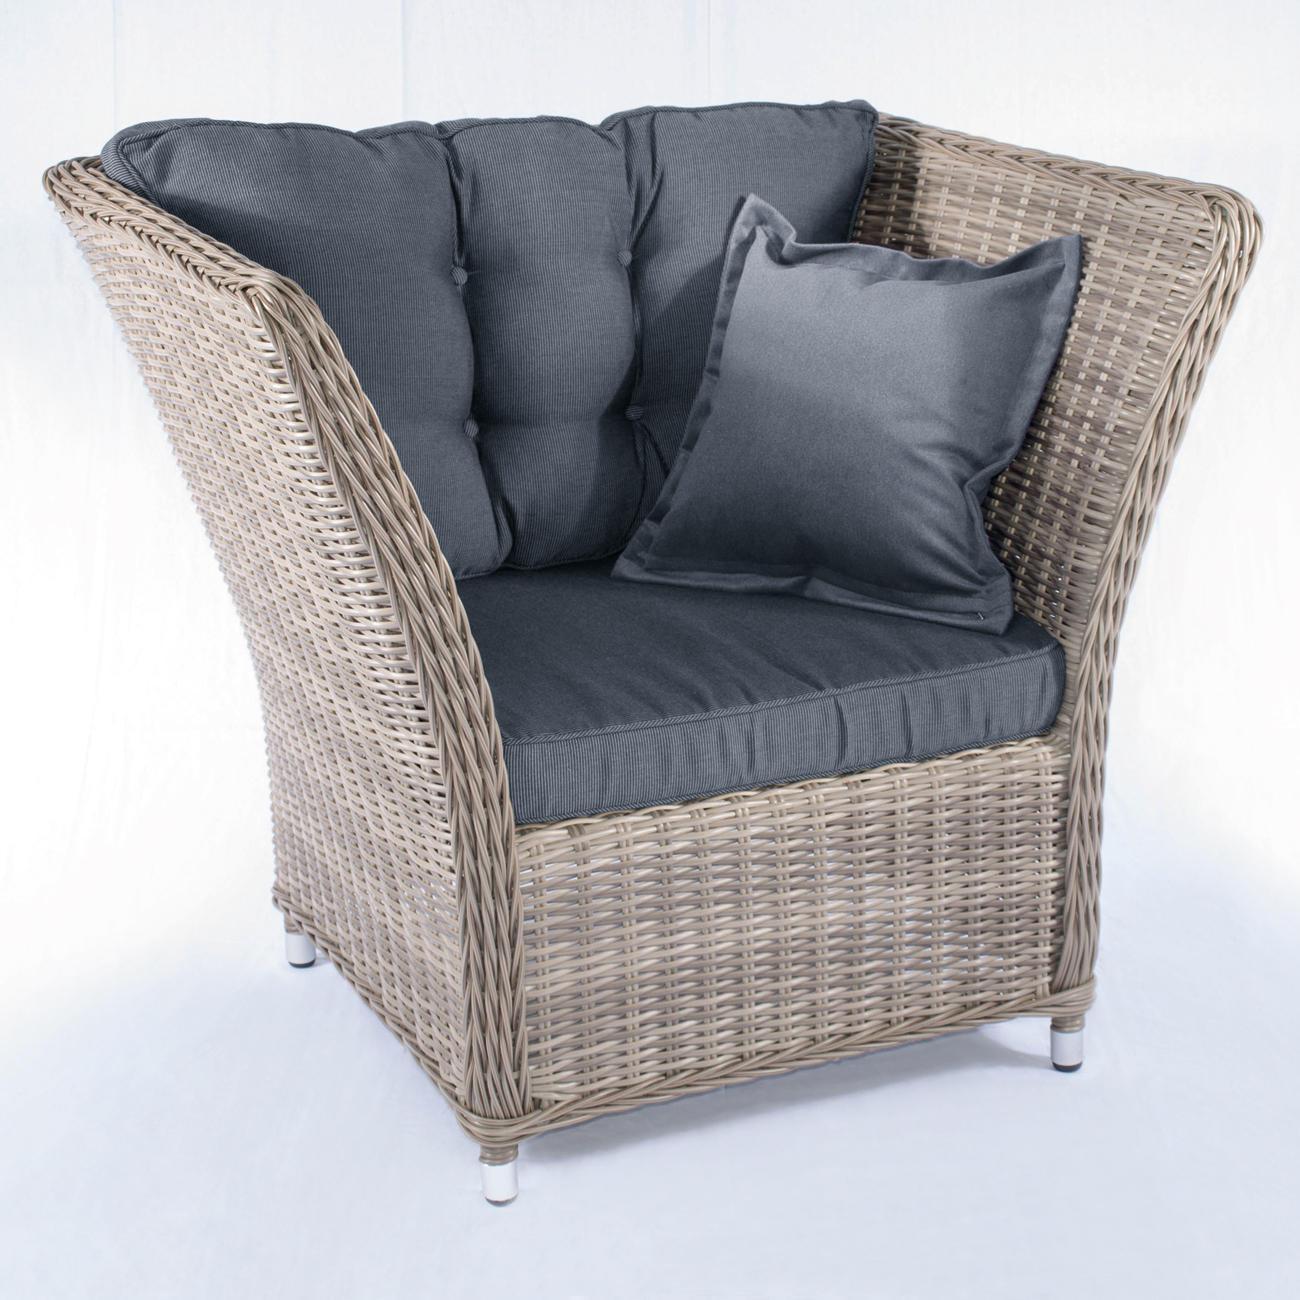 Polyrattan-Lounge-Möbel, Kuschel-Sessel